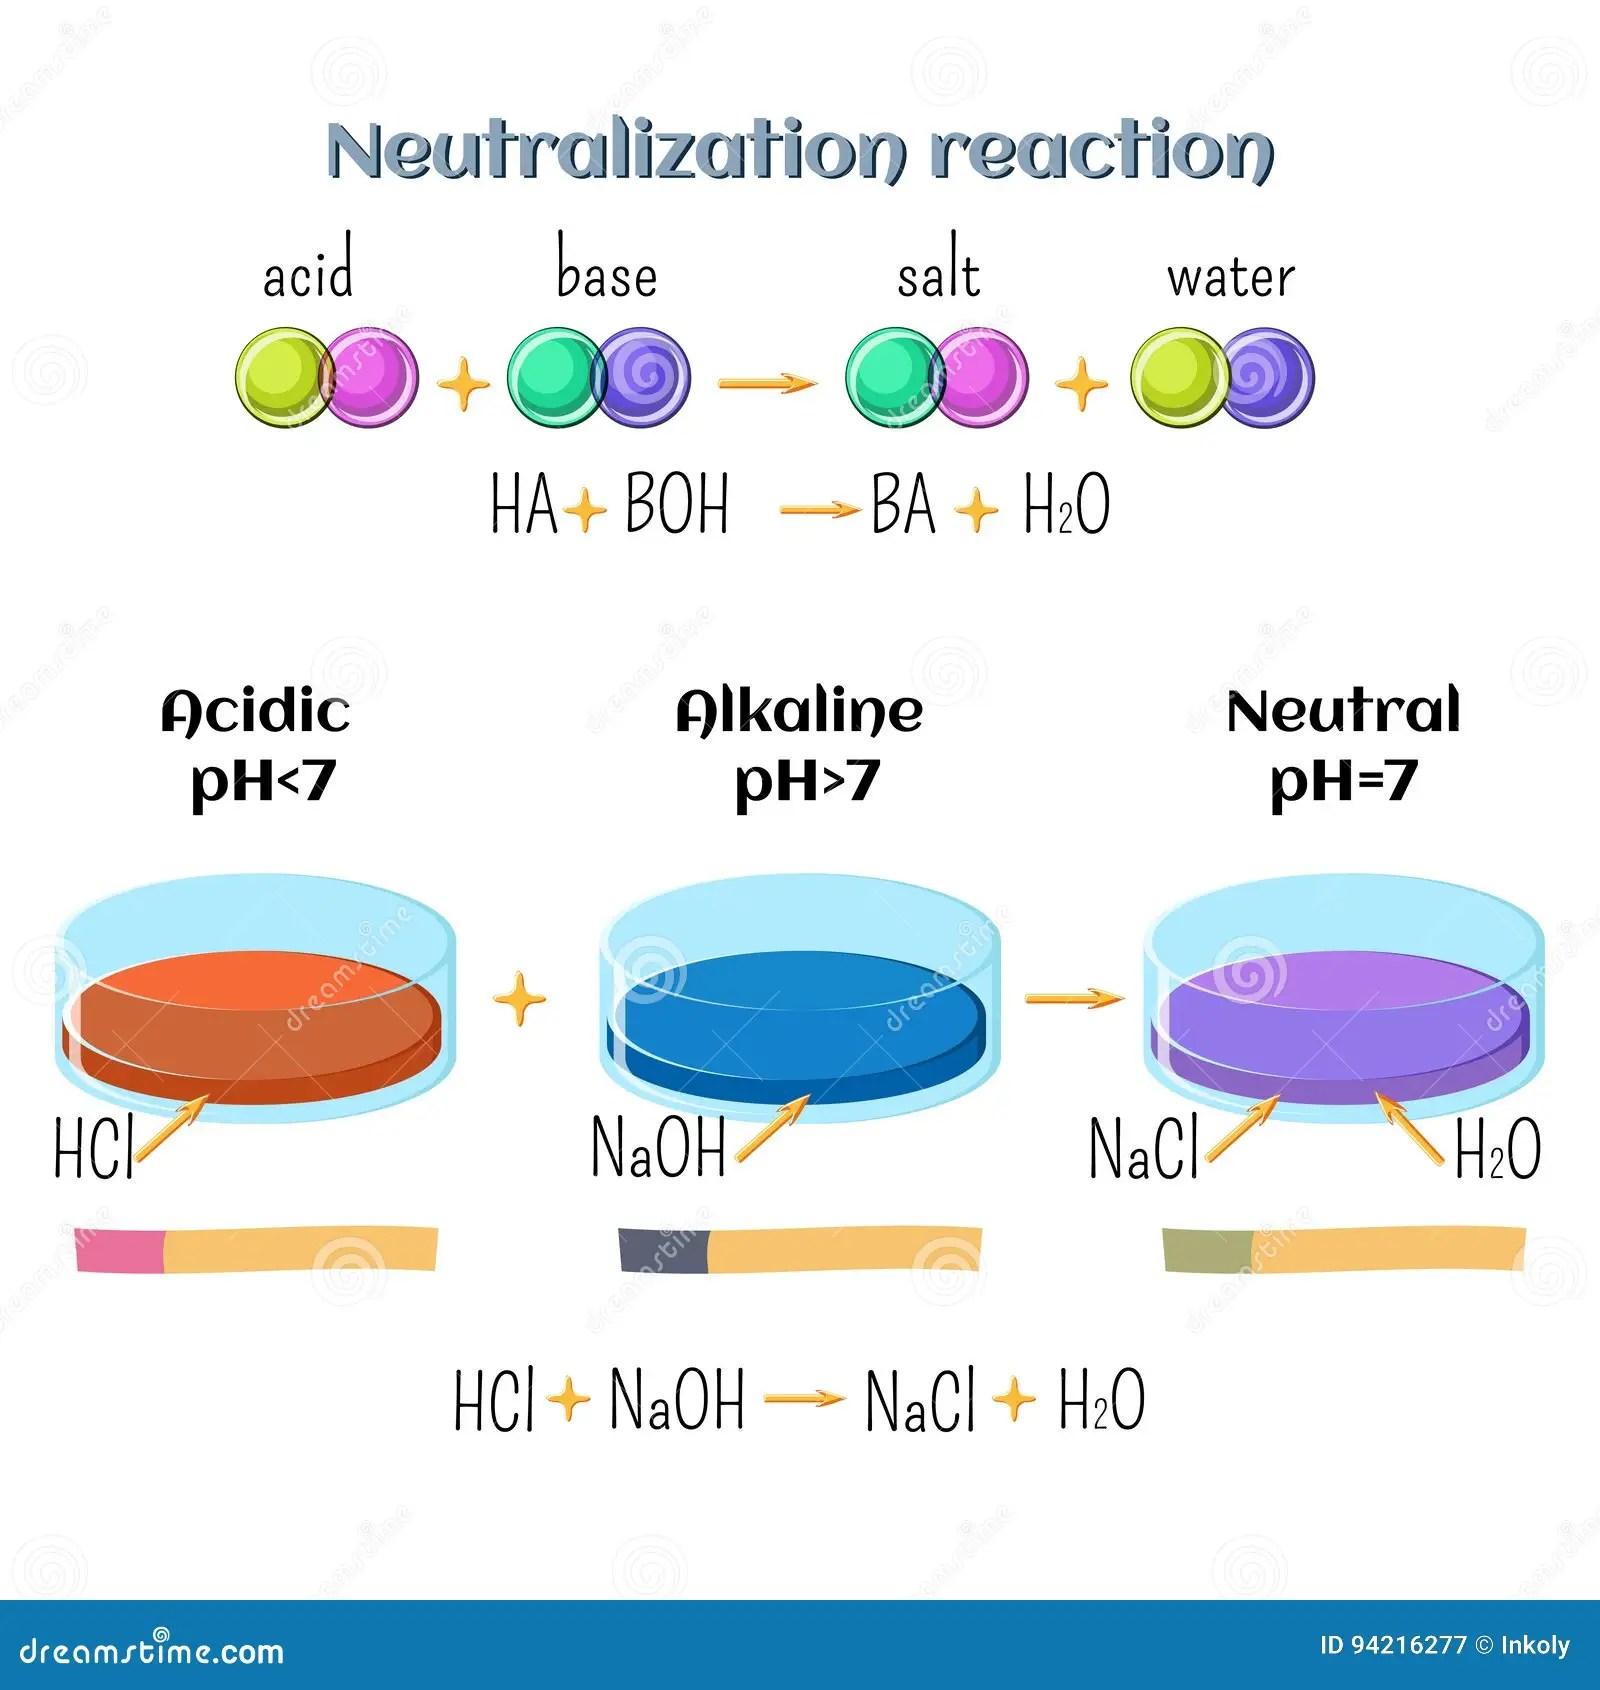 Acid Base Neutralization Reaction Of Hydrochloric Acid